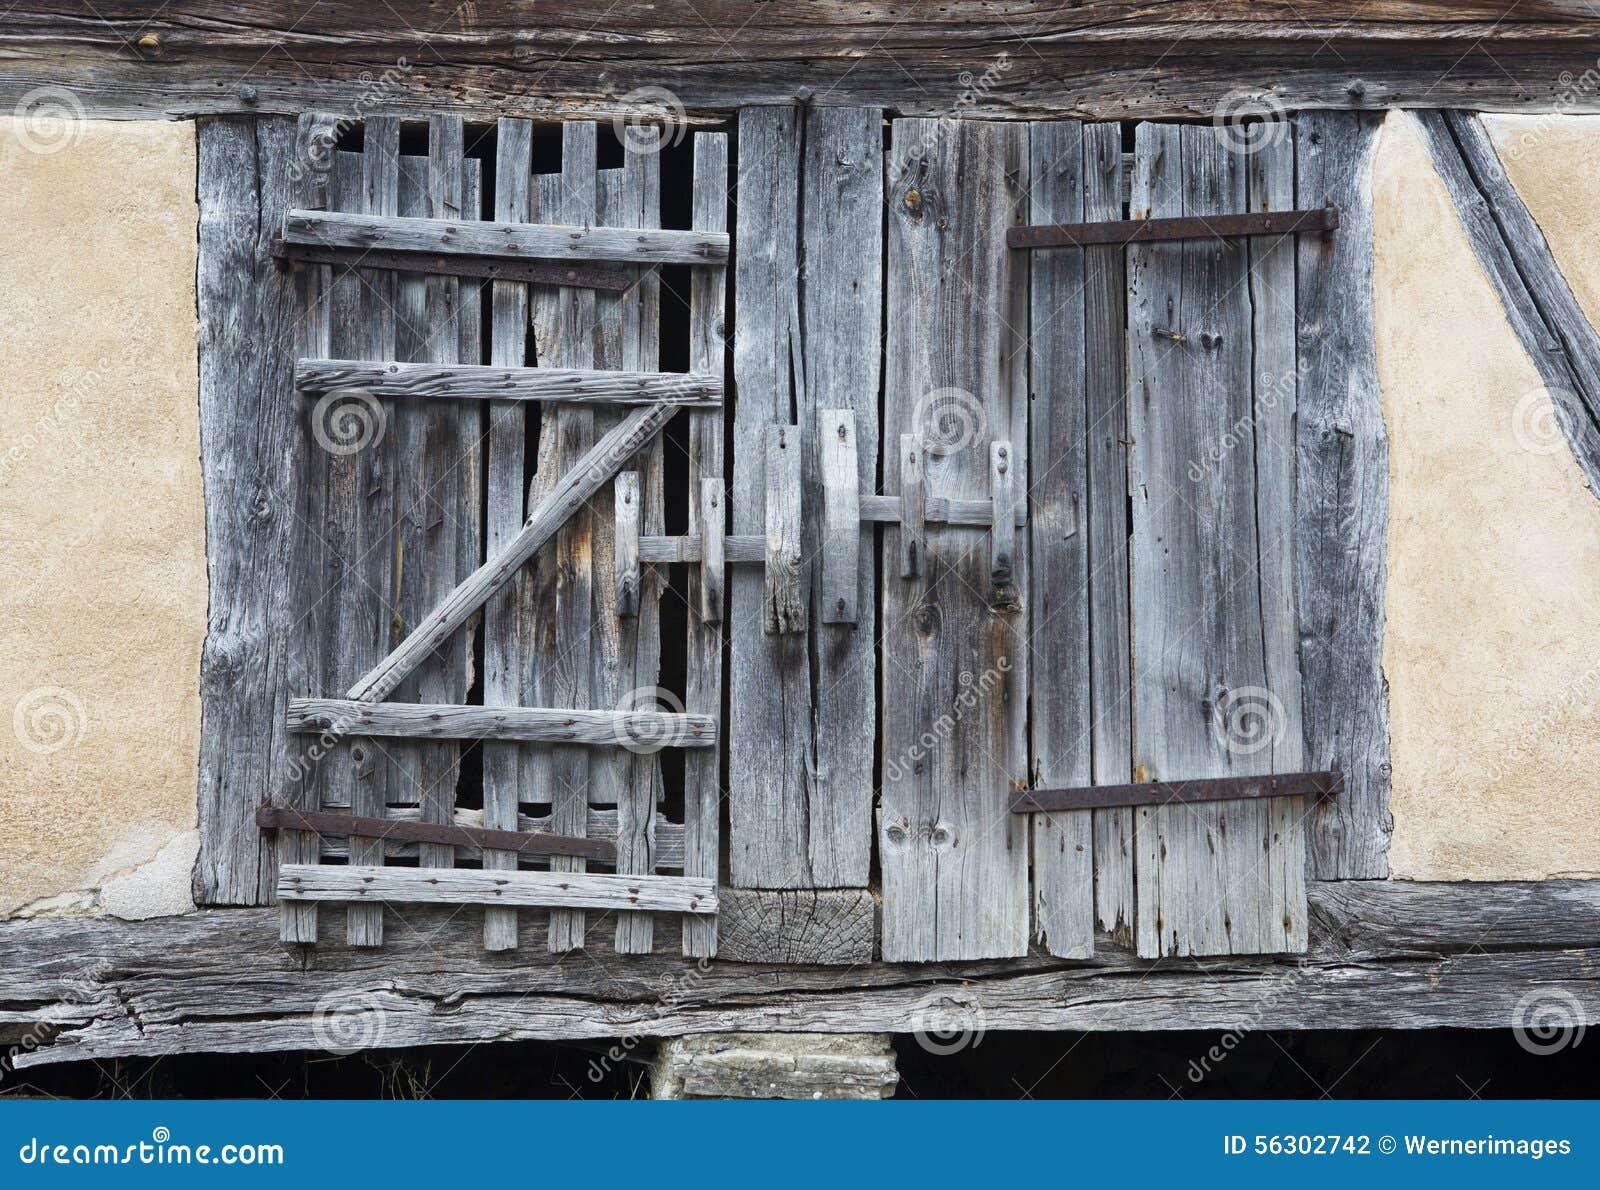 Porte de grange fashion designs - Vieille porte en bois ...